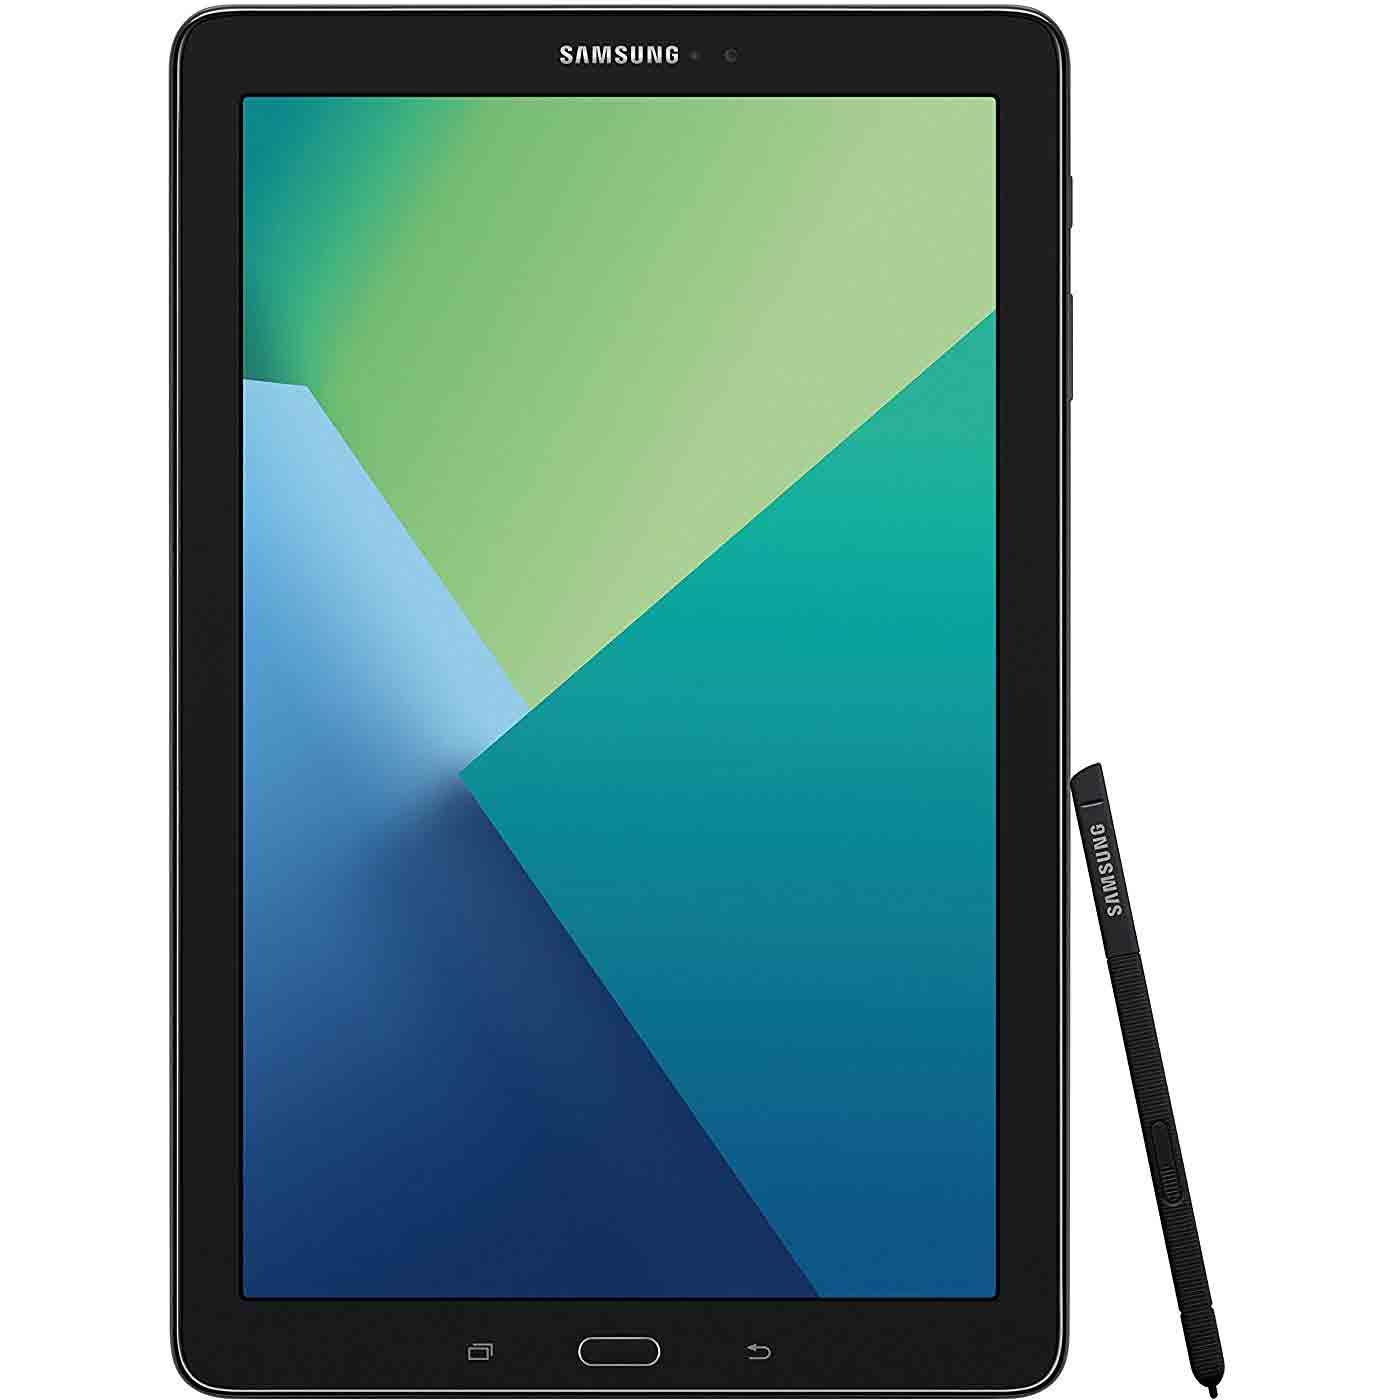 samsung galaxy tab a 10 1 tablet pc black w s pen wi fi. Black Bedroom Furniture Sets. Home Design Ideas